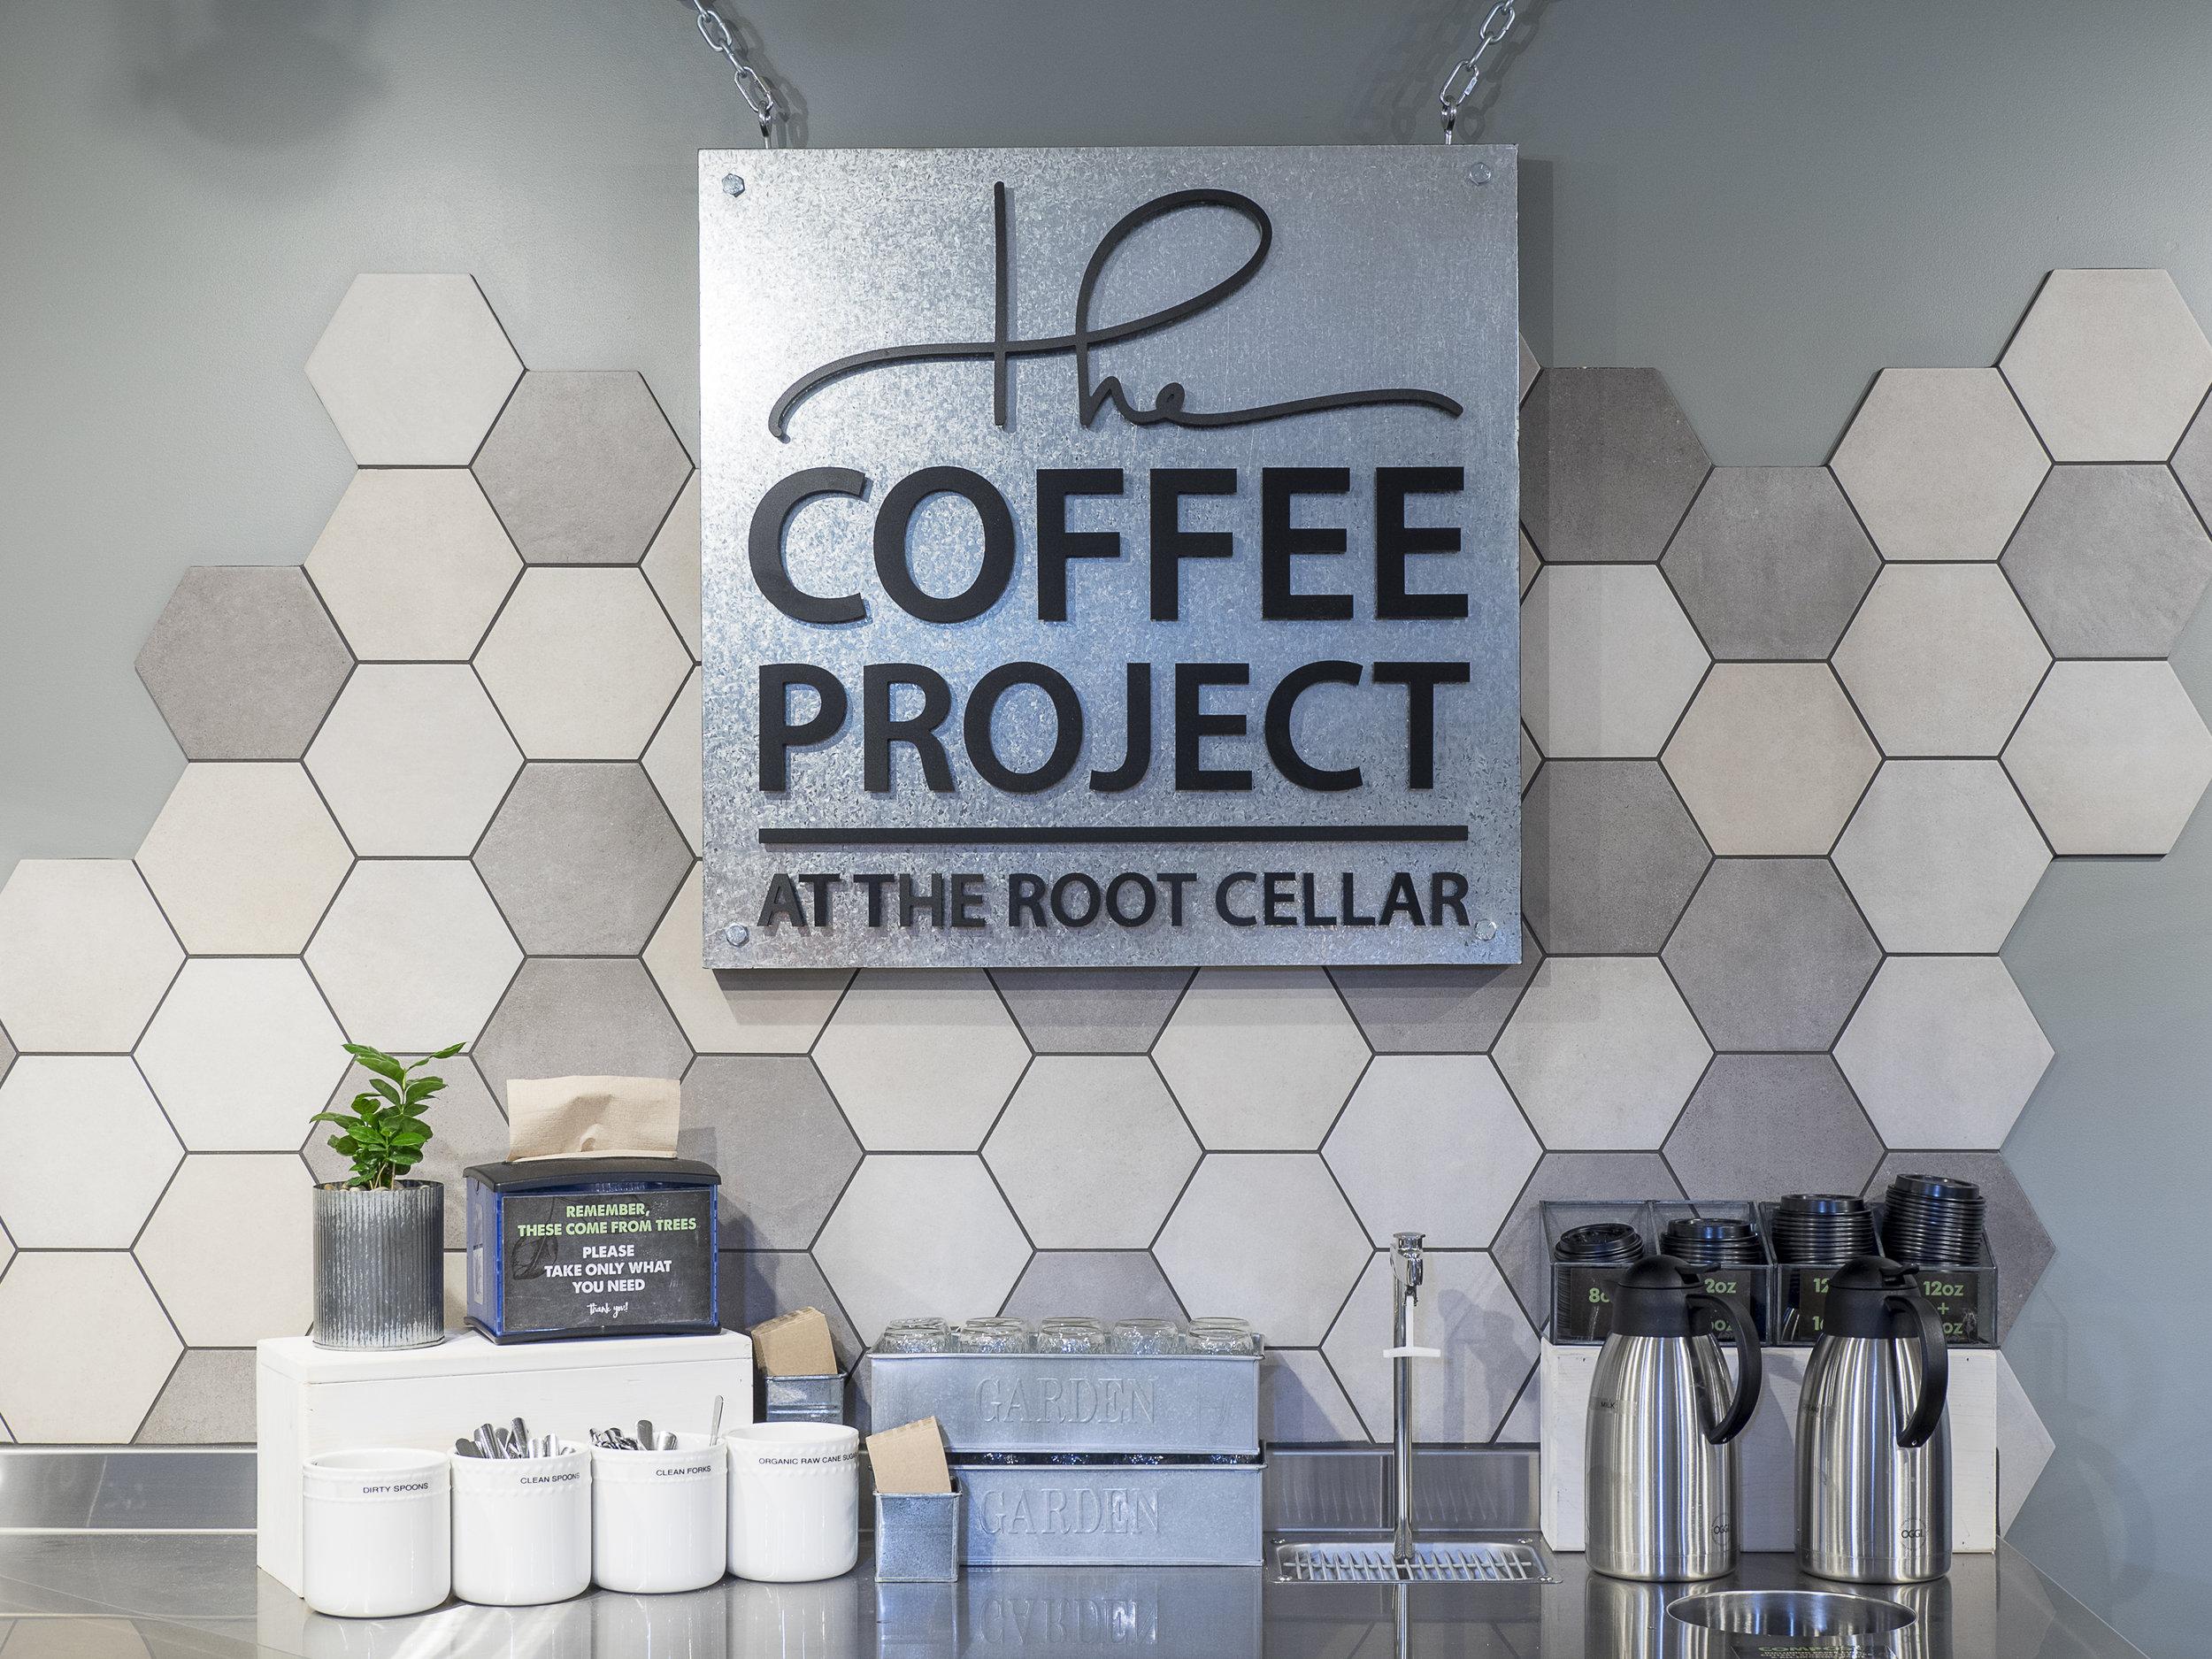 the coffee project {Print}-109.jpg